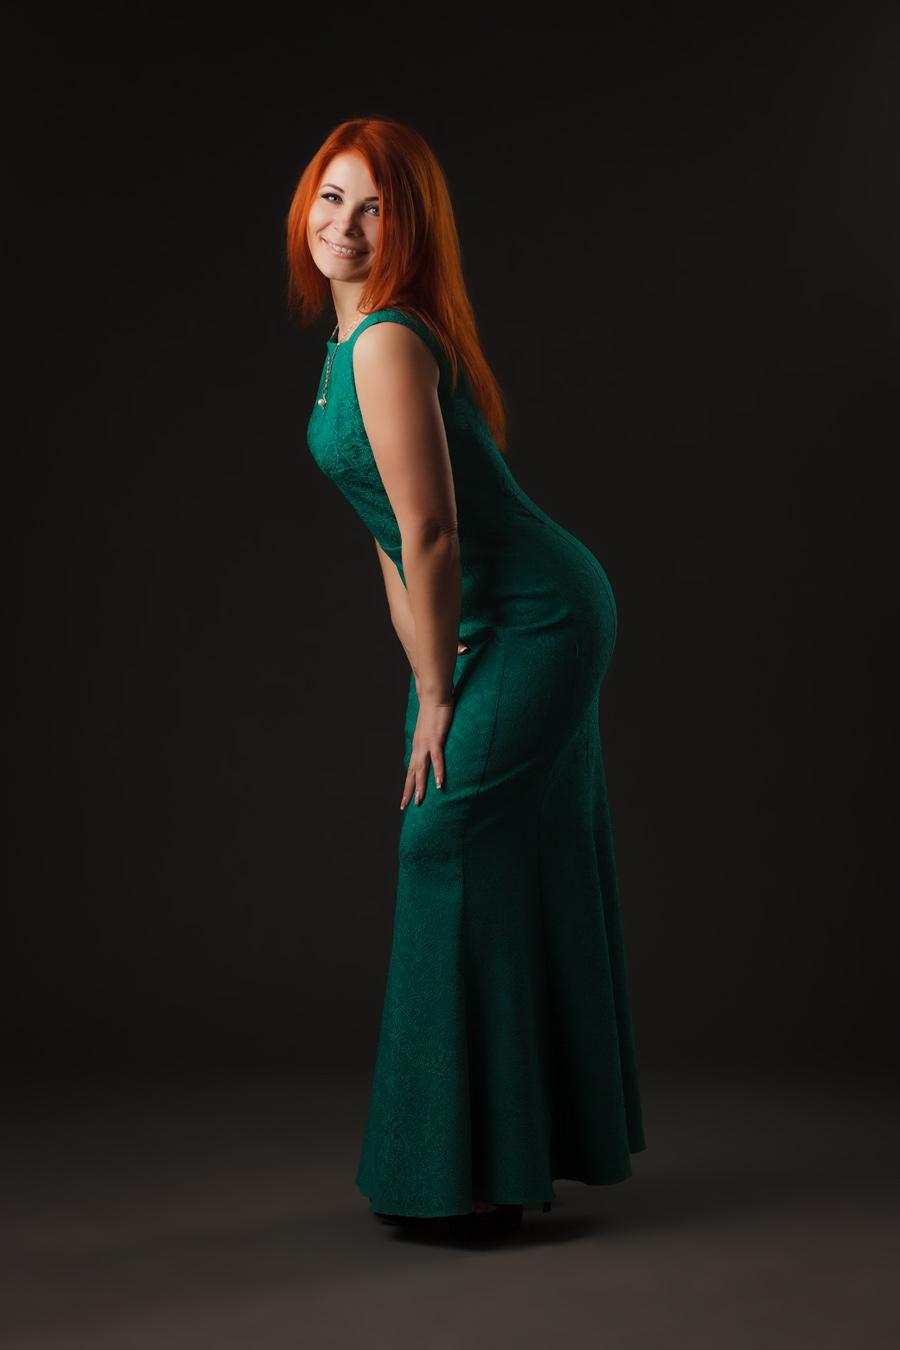 Ольга, студийная фотосъёмка, Абакан